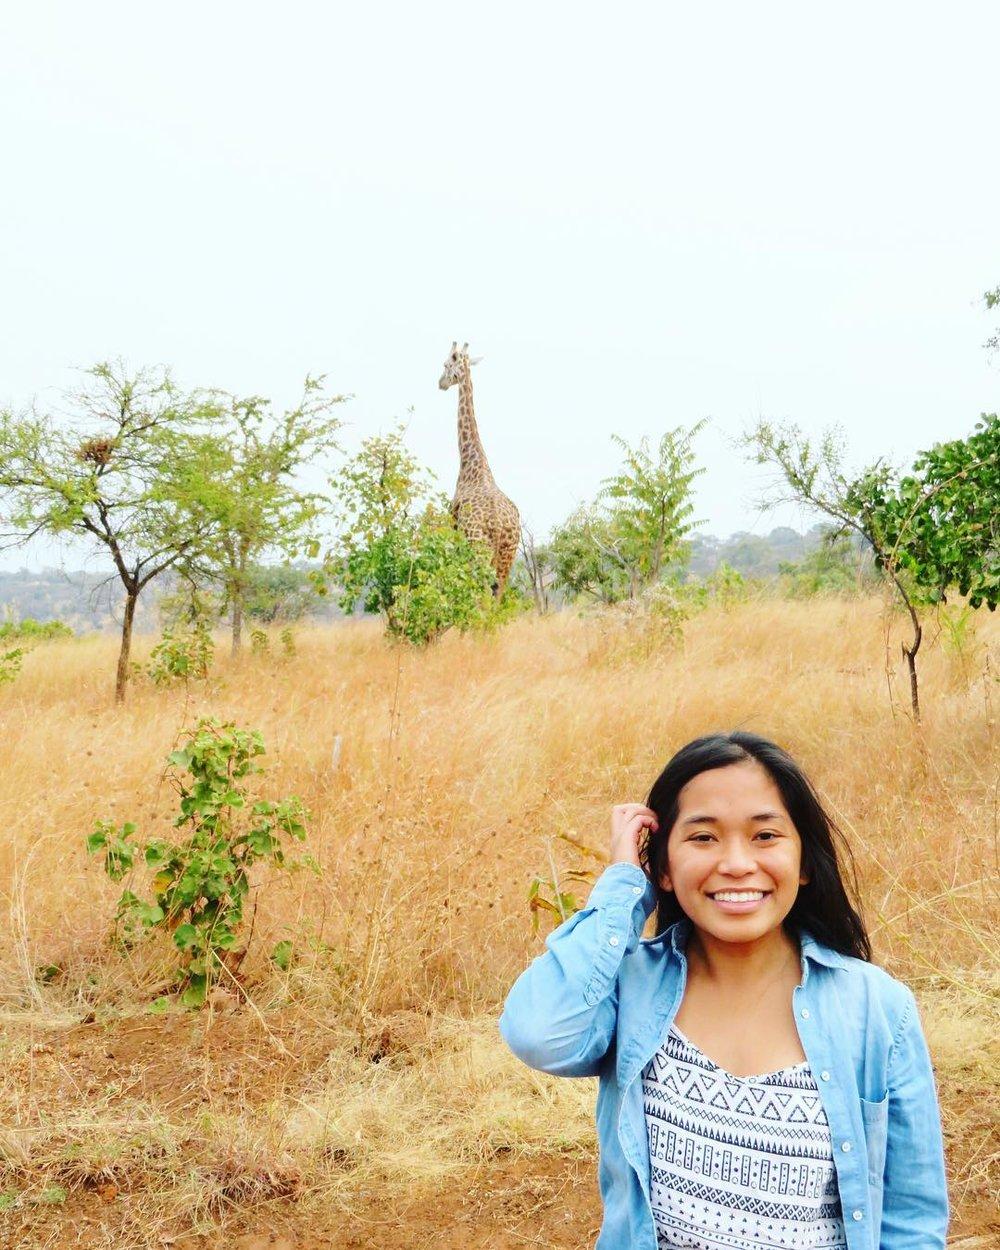 A giraffe close by at Akagera National Park in Kigali, Rwanda.